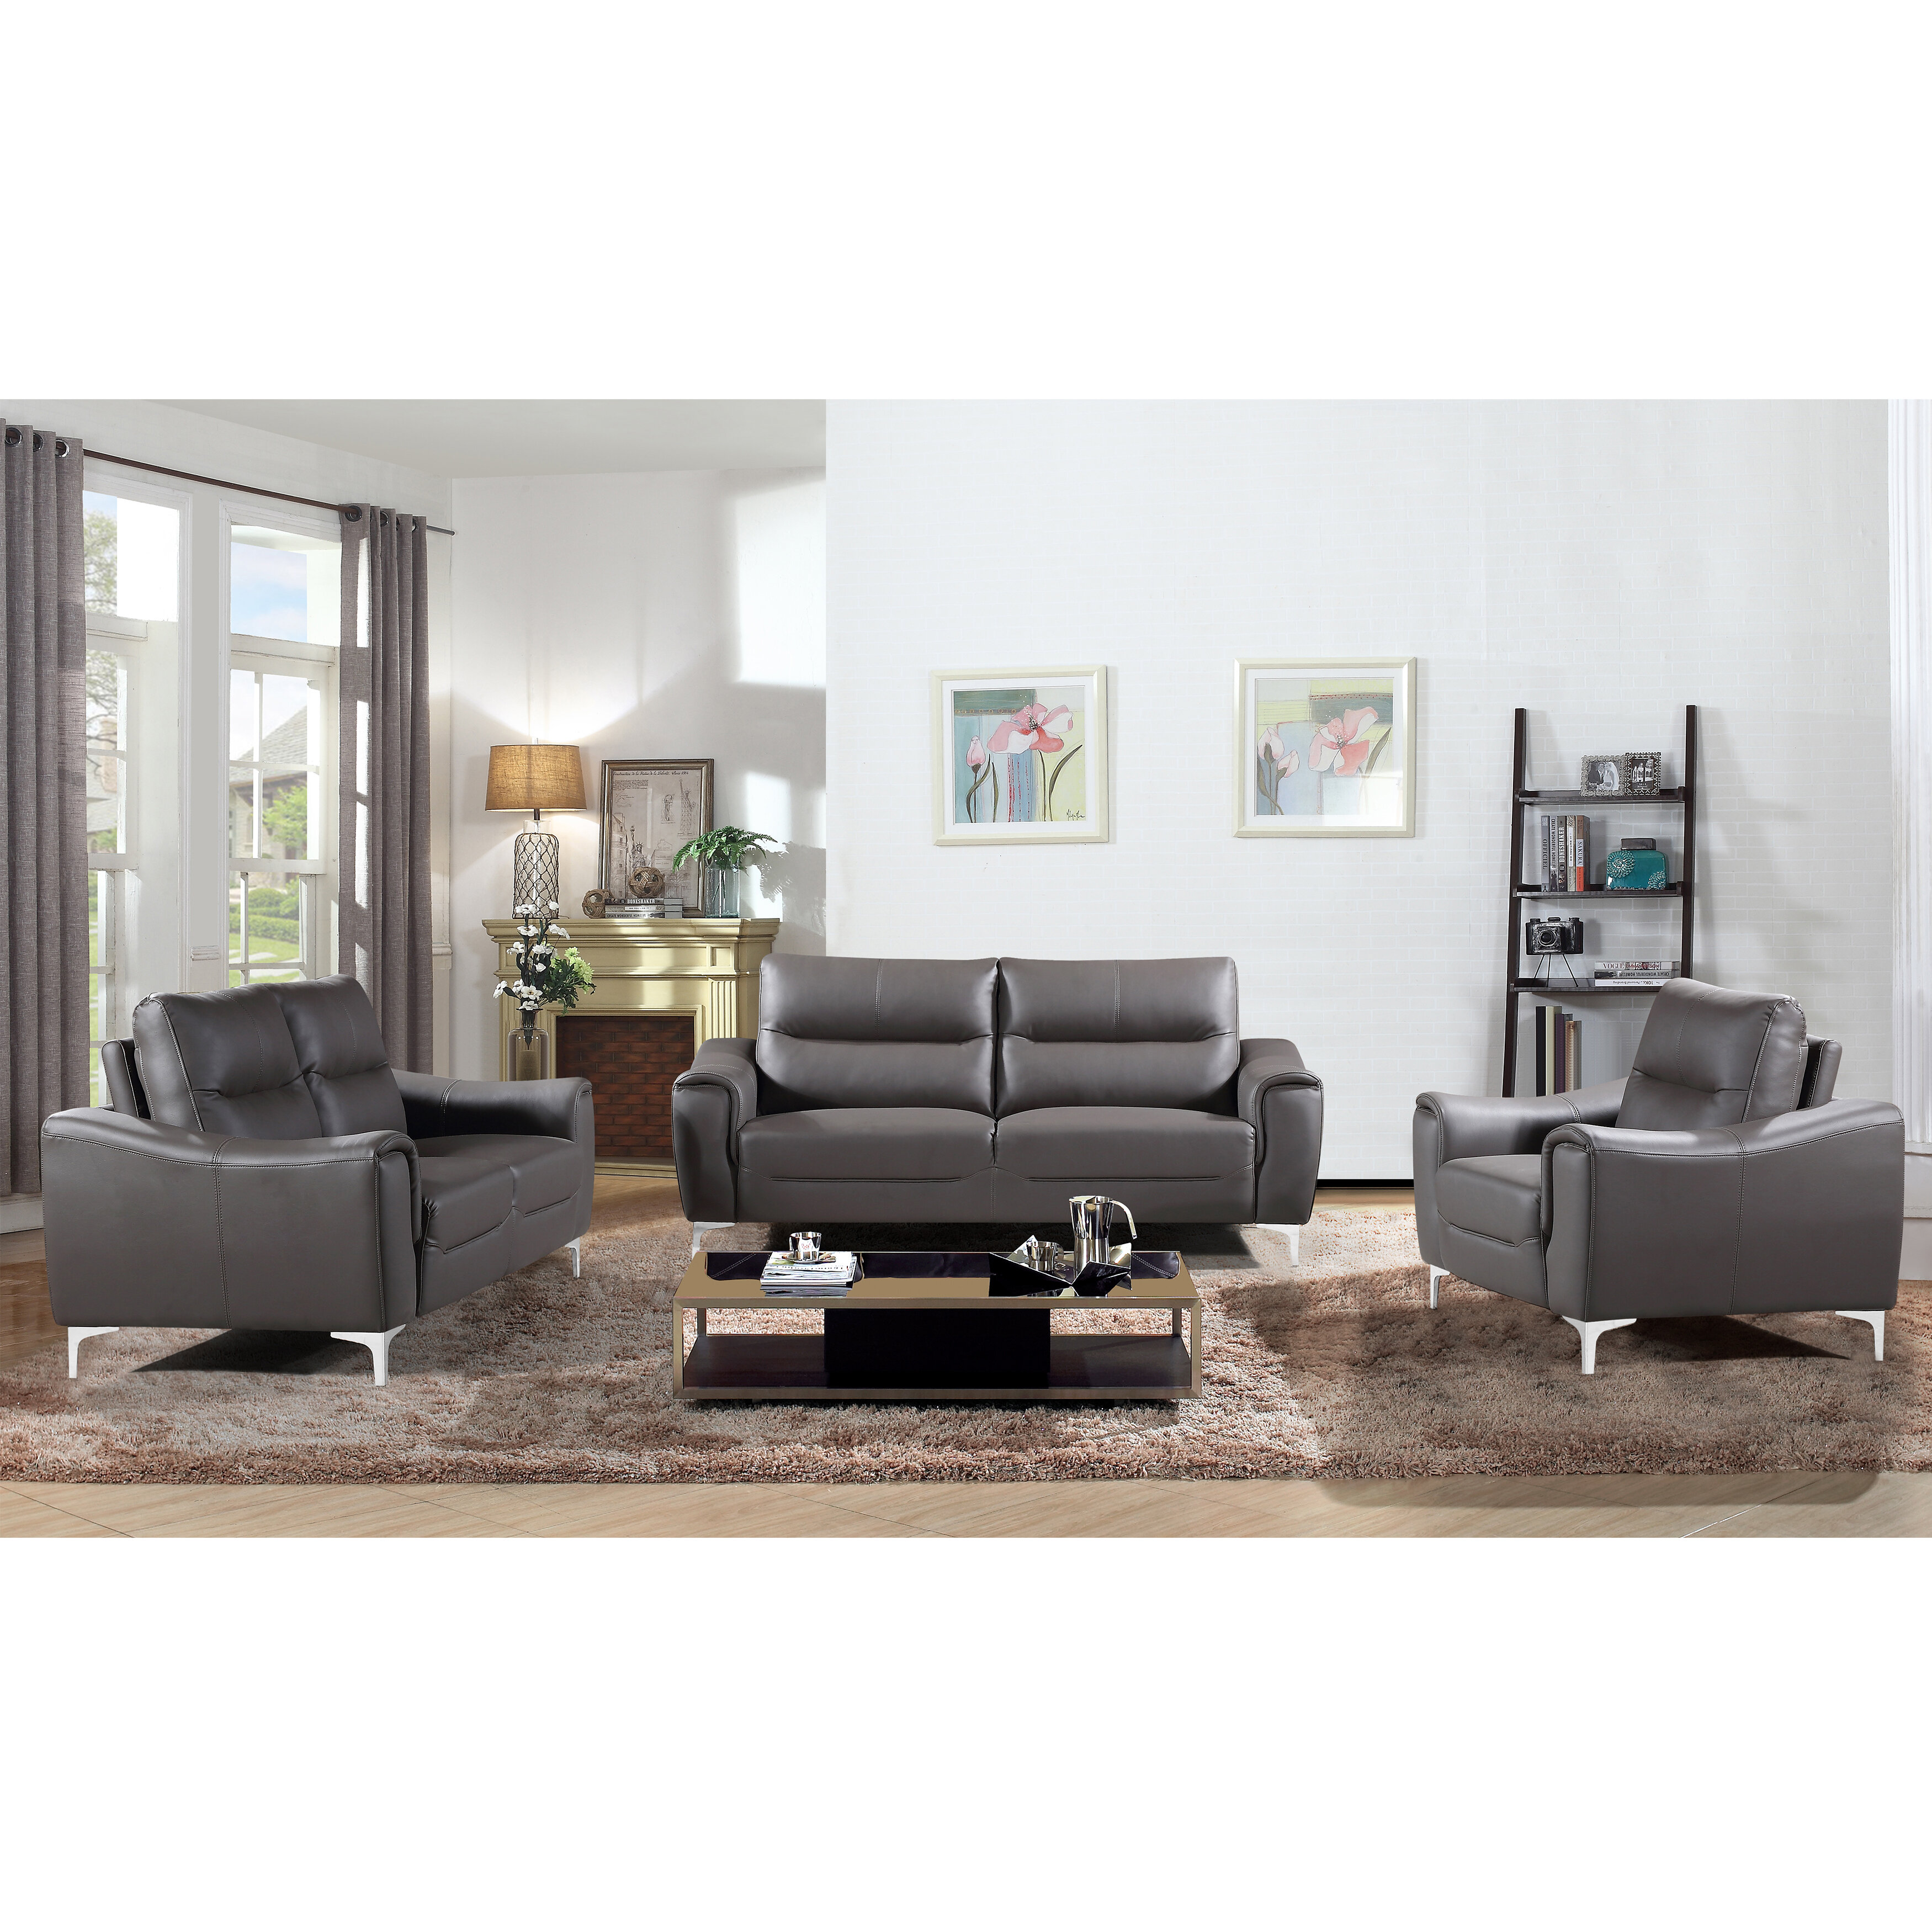 Orren Ellis Malissa 3 Piece Living Room Set & Reviews | Wayfair